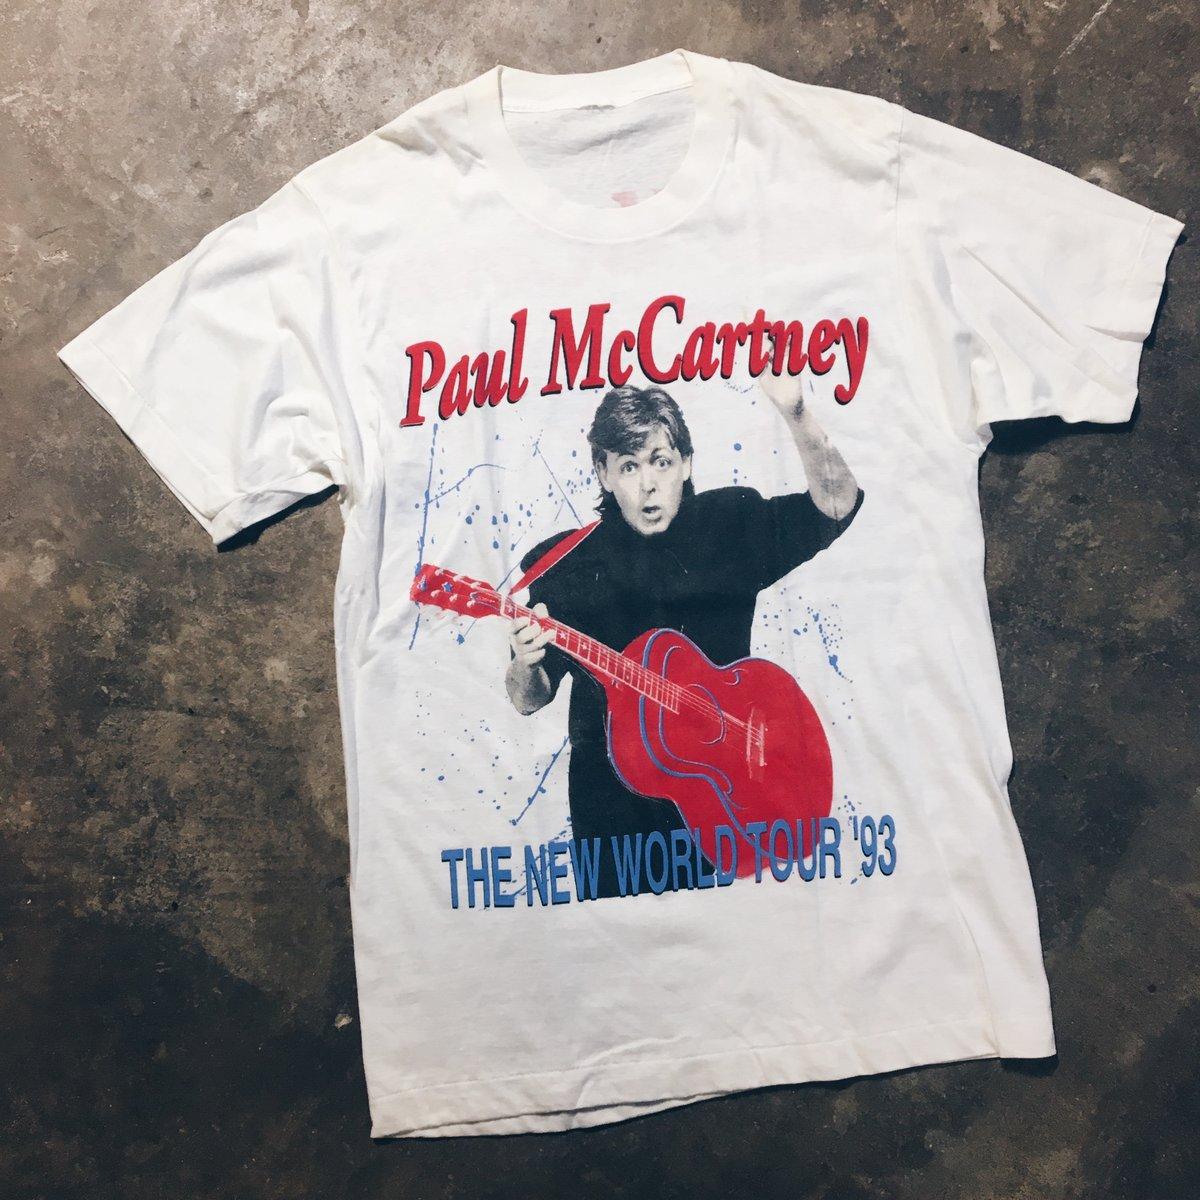 Image of Original 1993 Paul McCartney World Tour Tee.